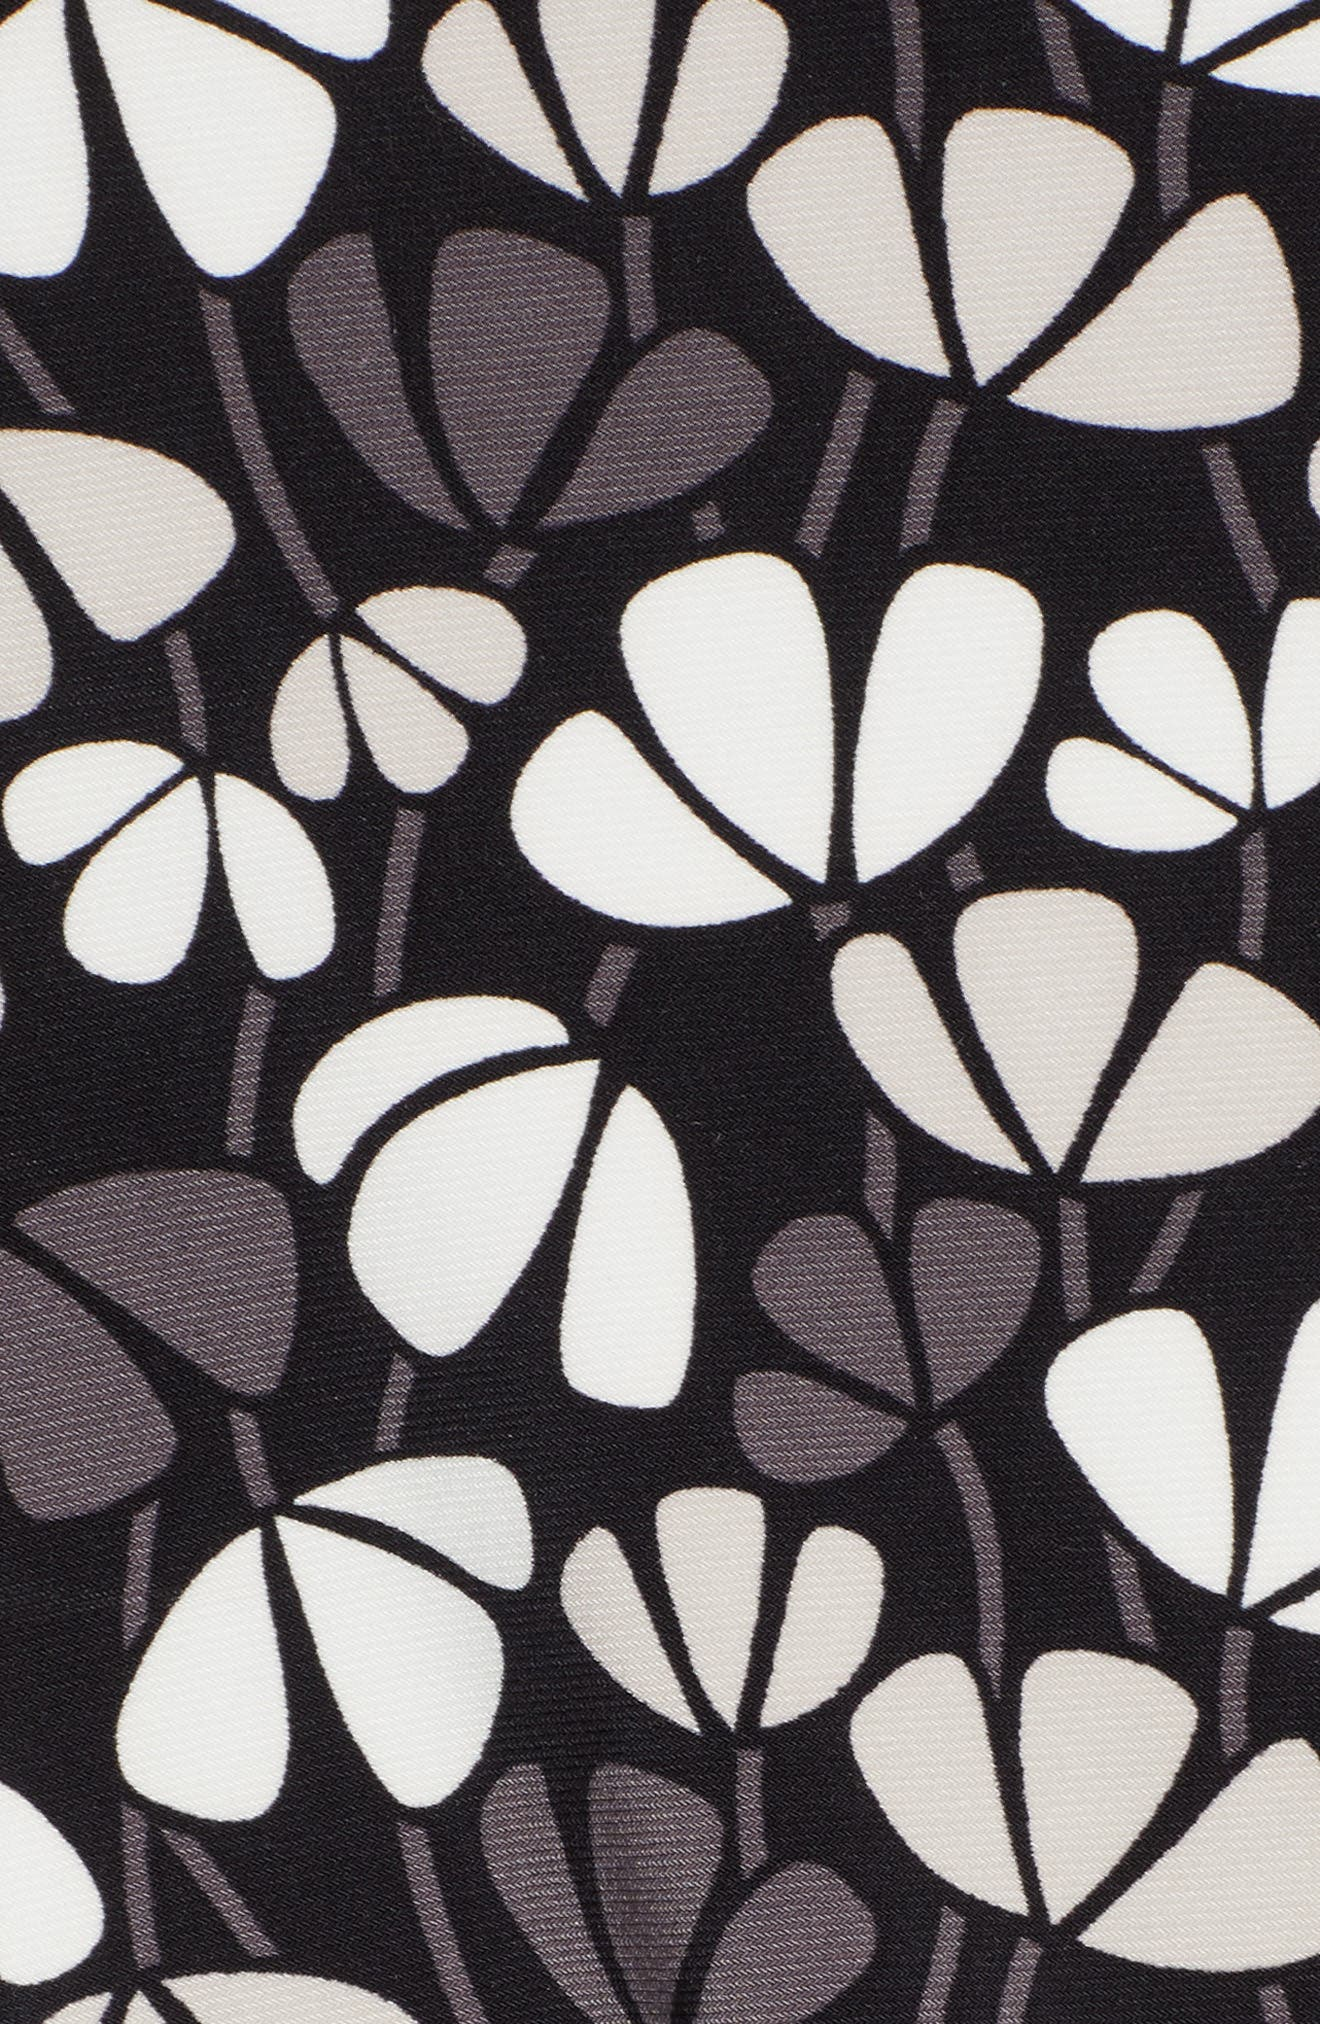 Flowerfall Stretch Knit Swing Dress,                             Alternate thumbnail 6, color,                             001